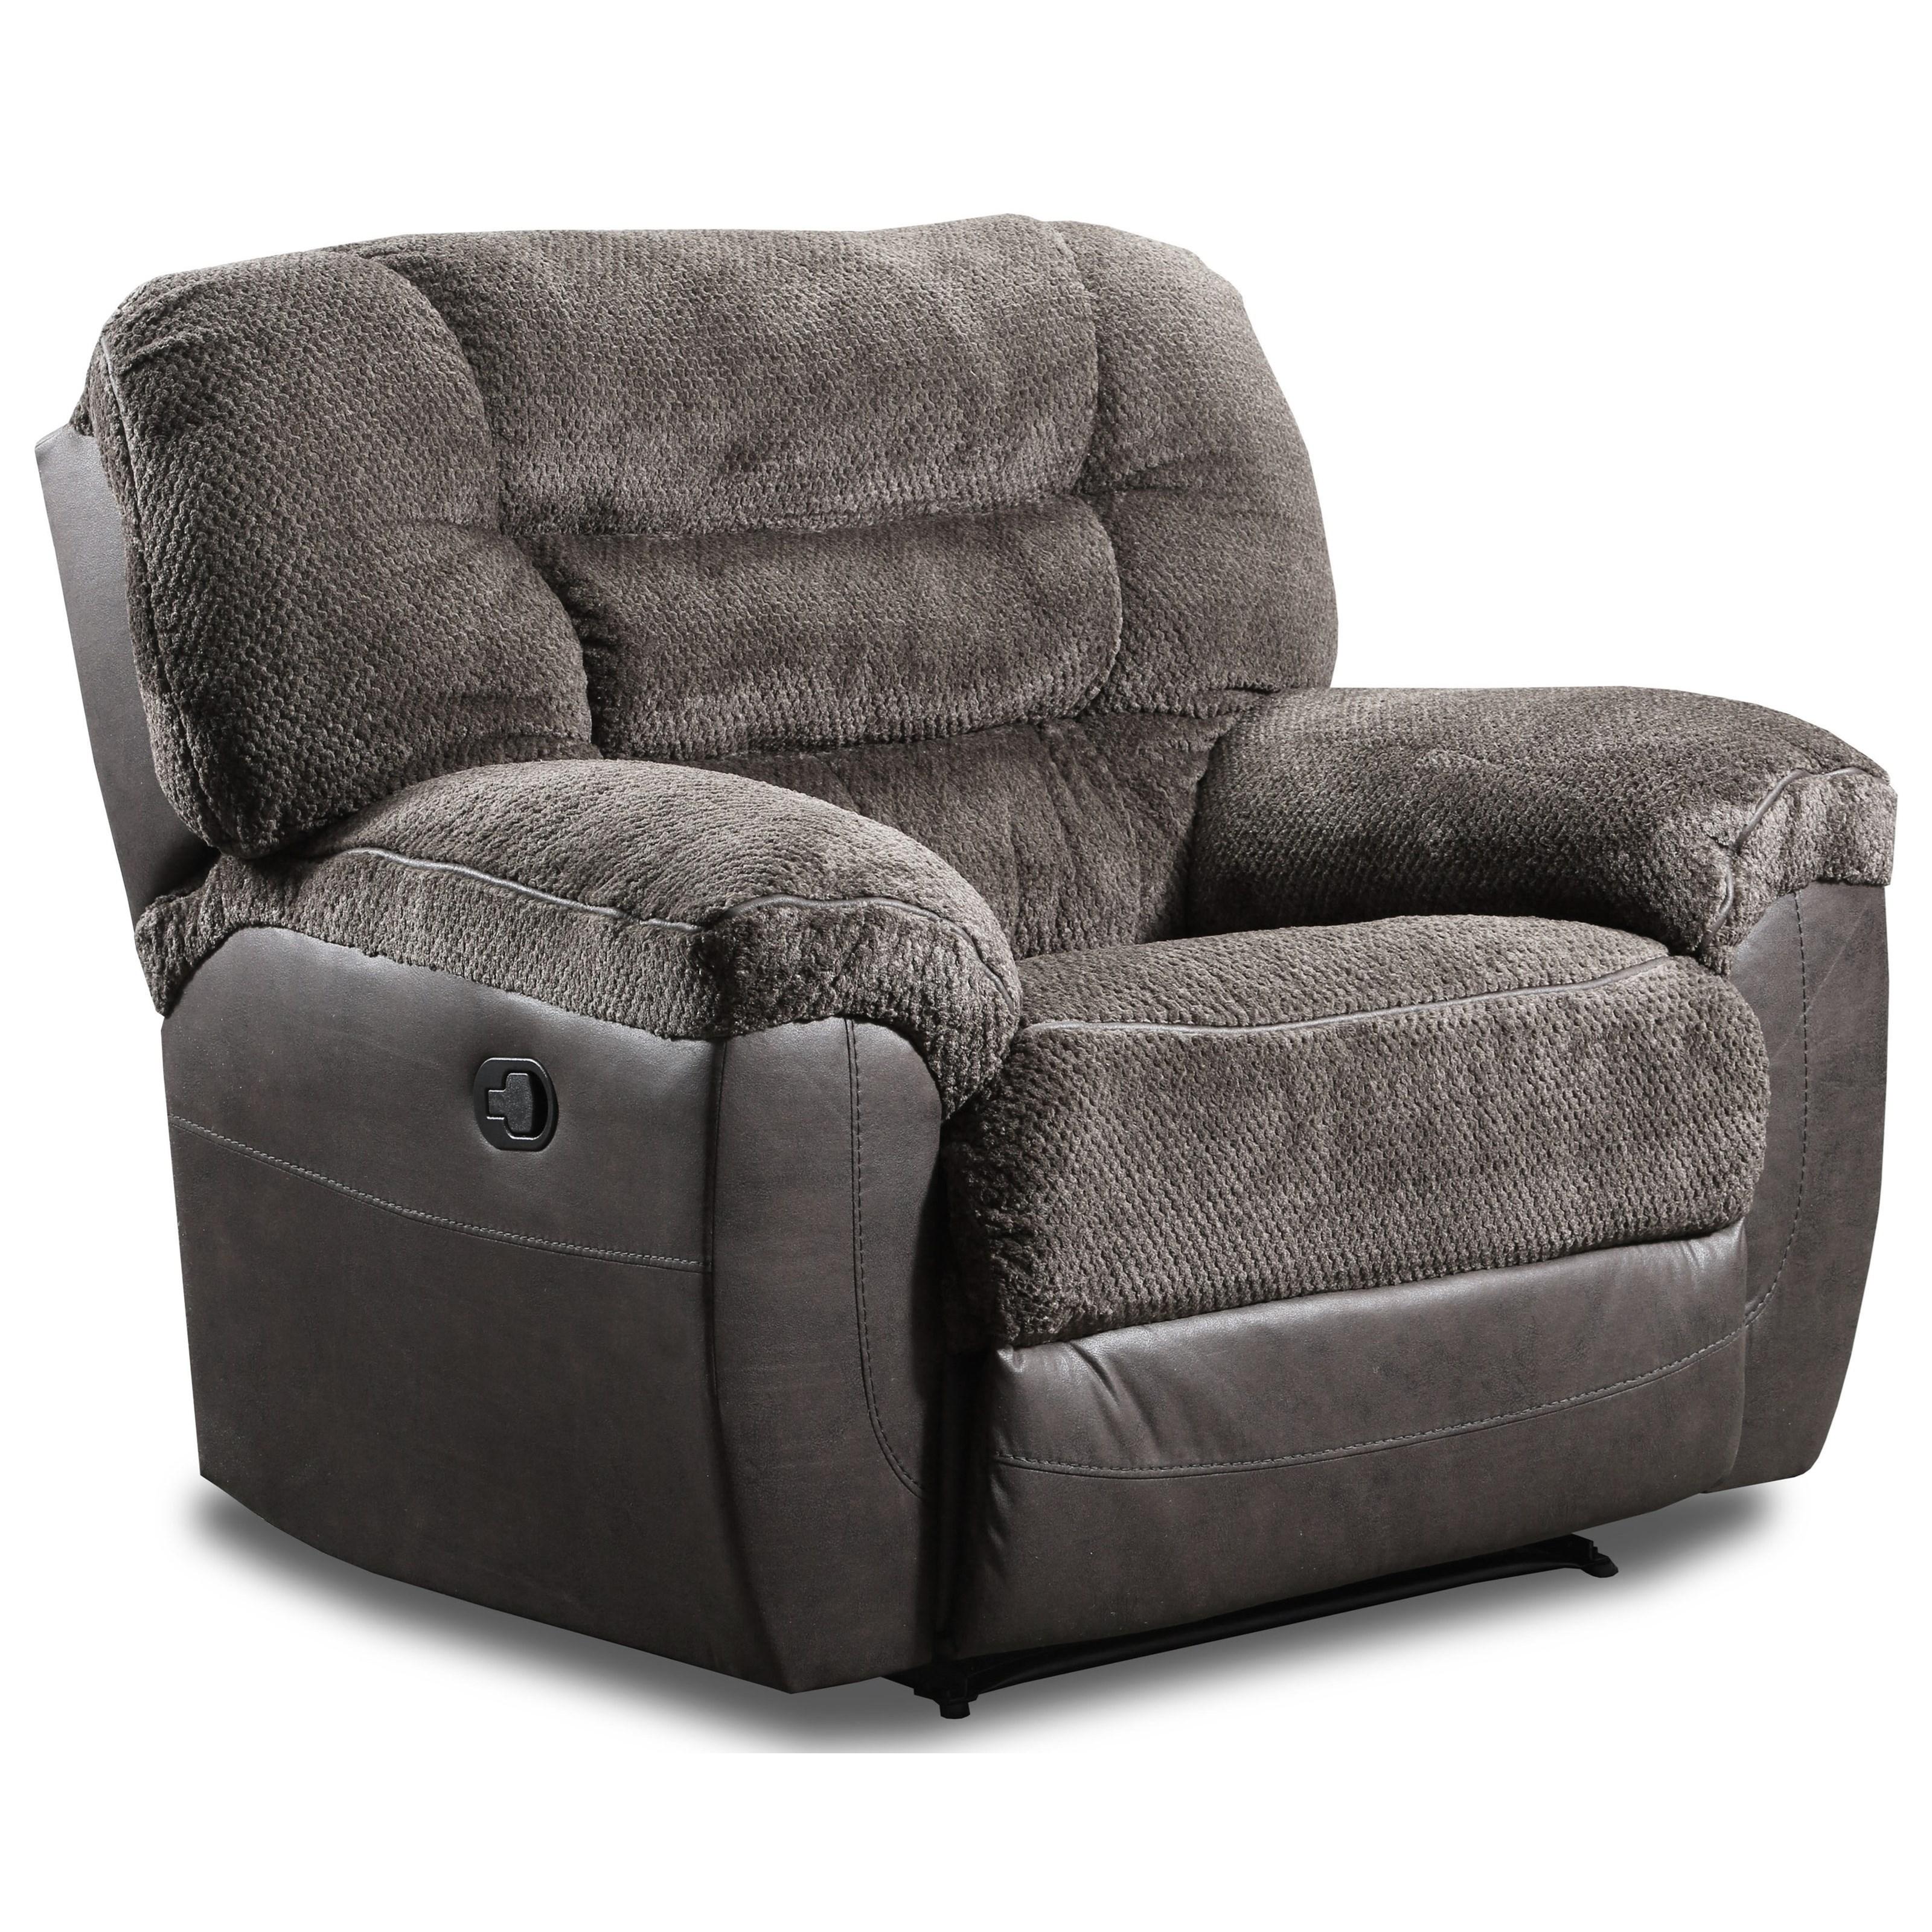 50439BR Reclining Cuddler Recliner by United Furniture Industries at Bullard Furniture